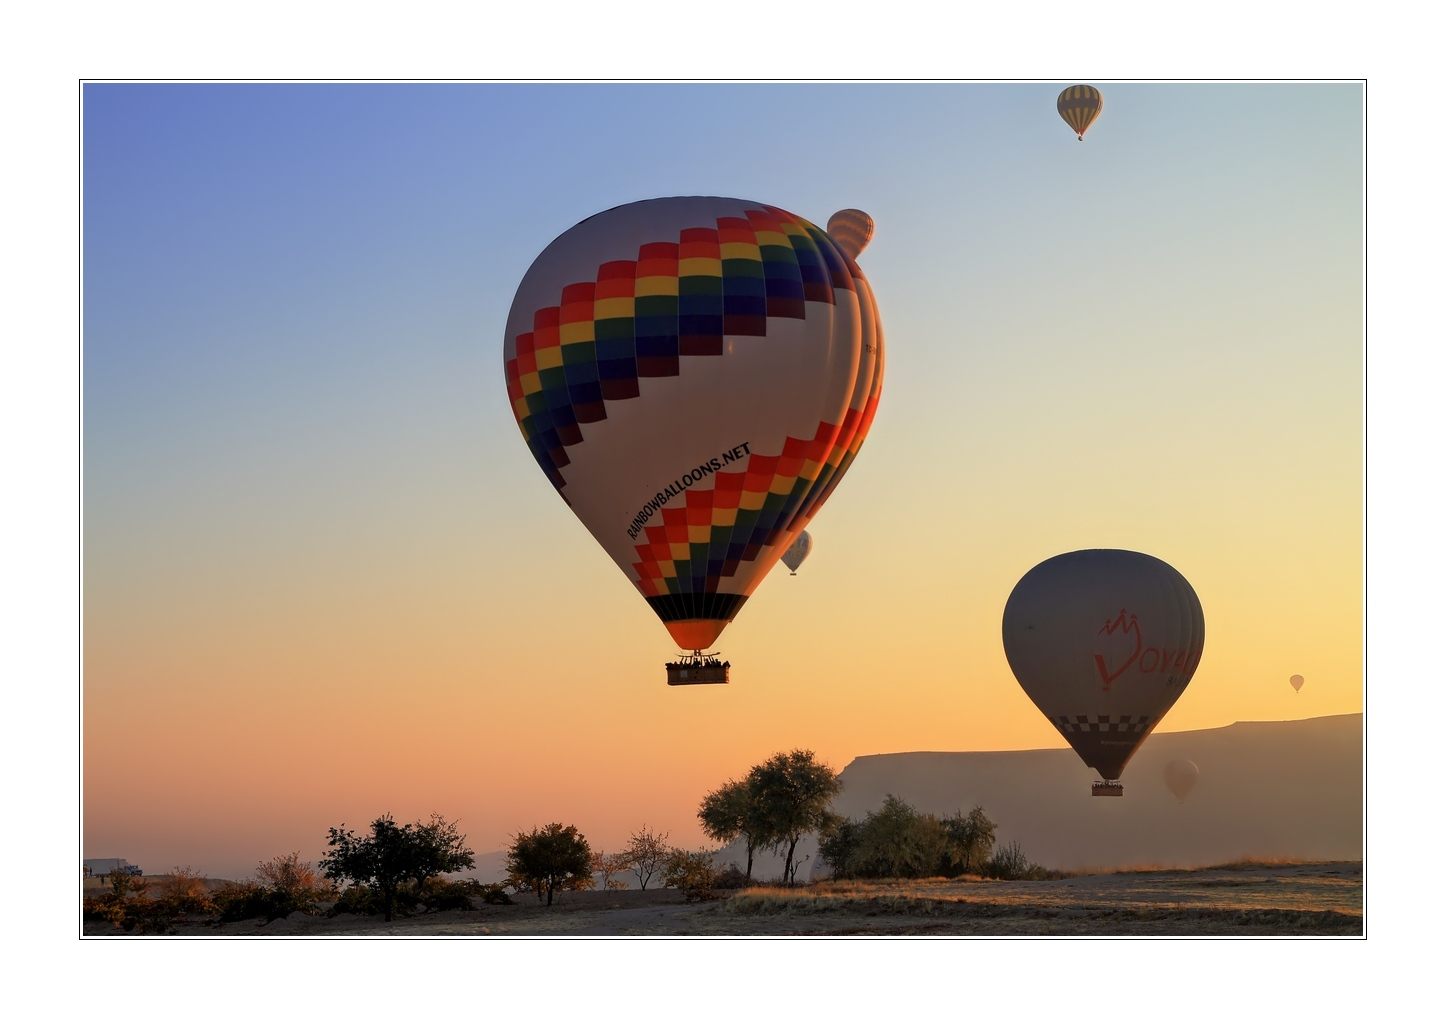 Rainbowballoons